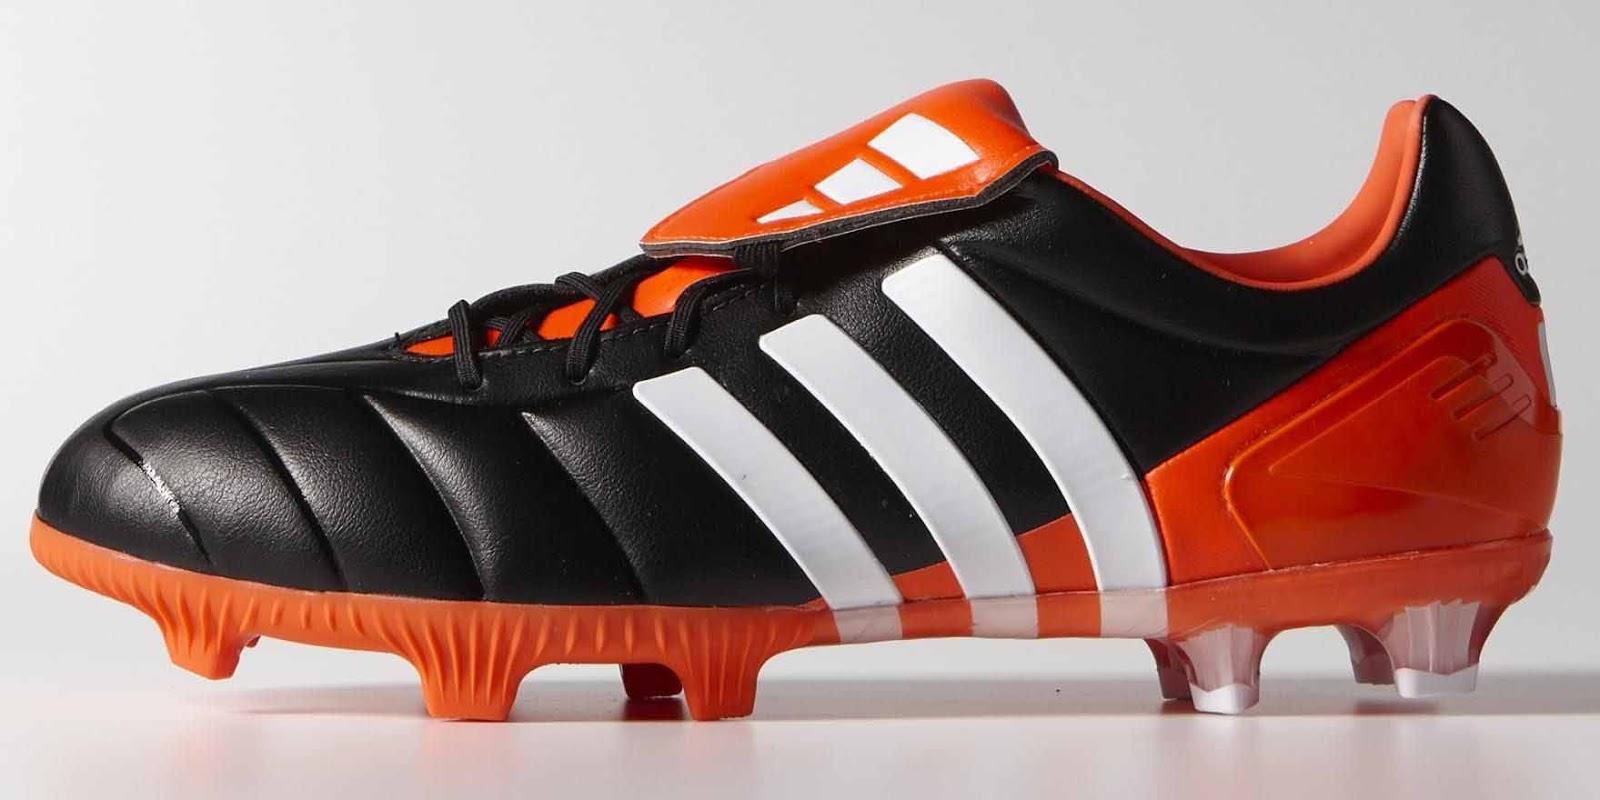 adidas predator mania 2002 remake (1)